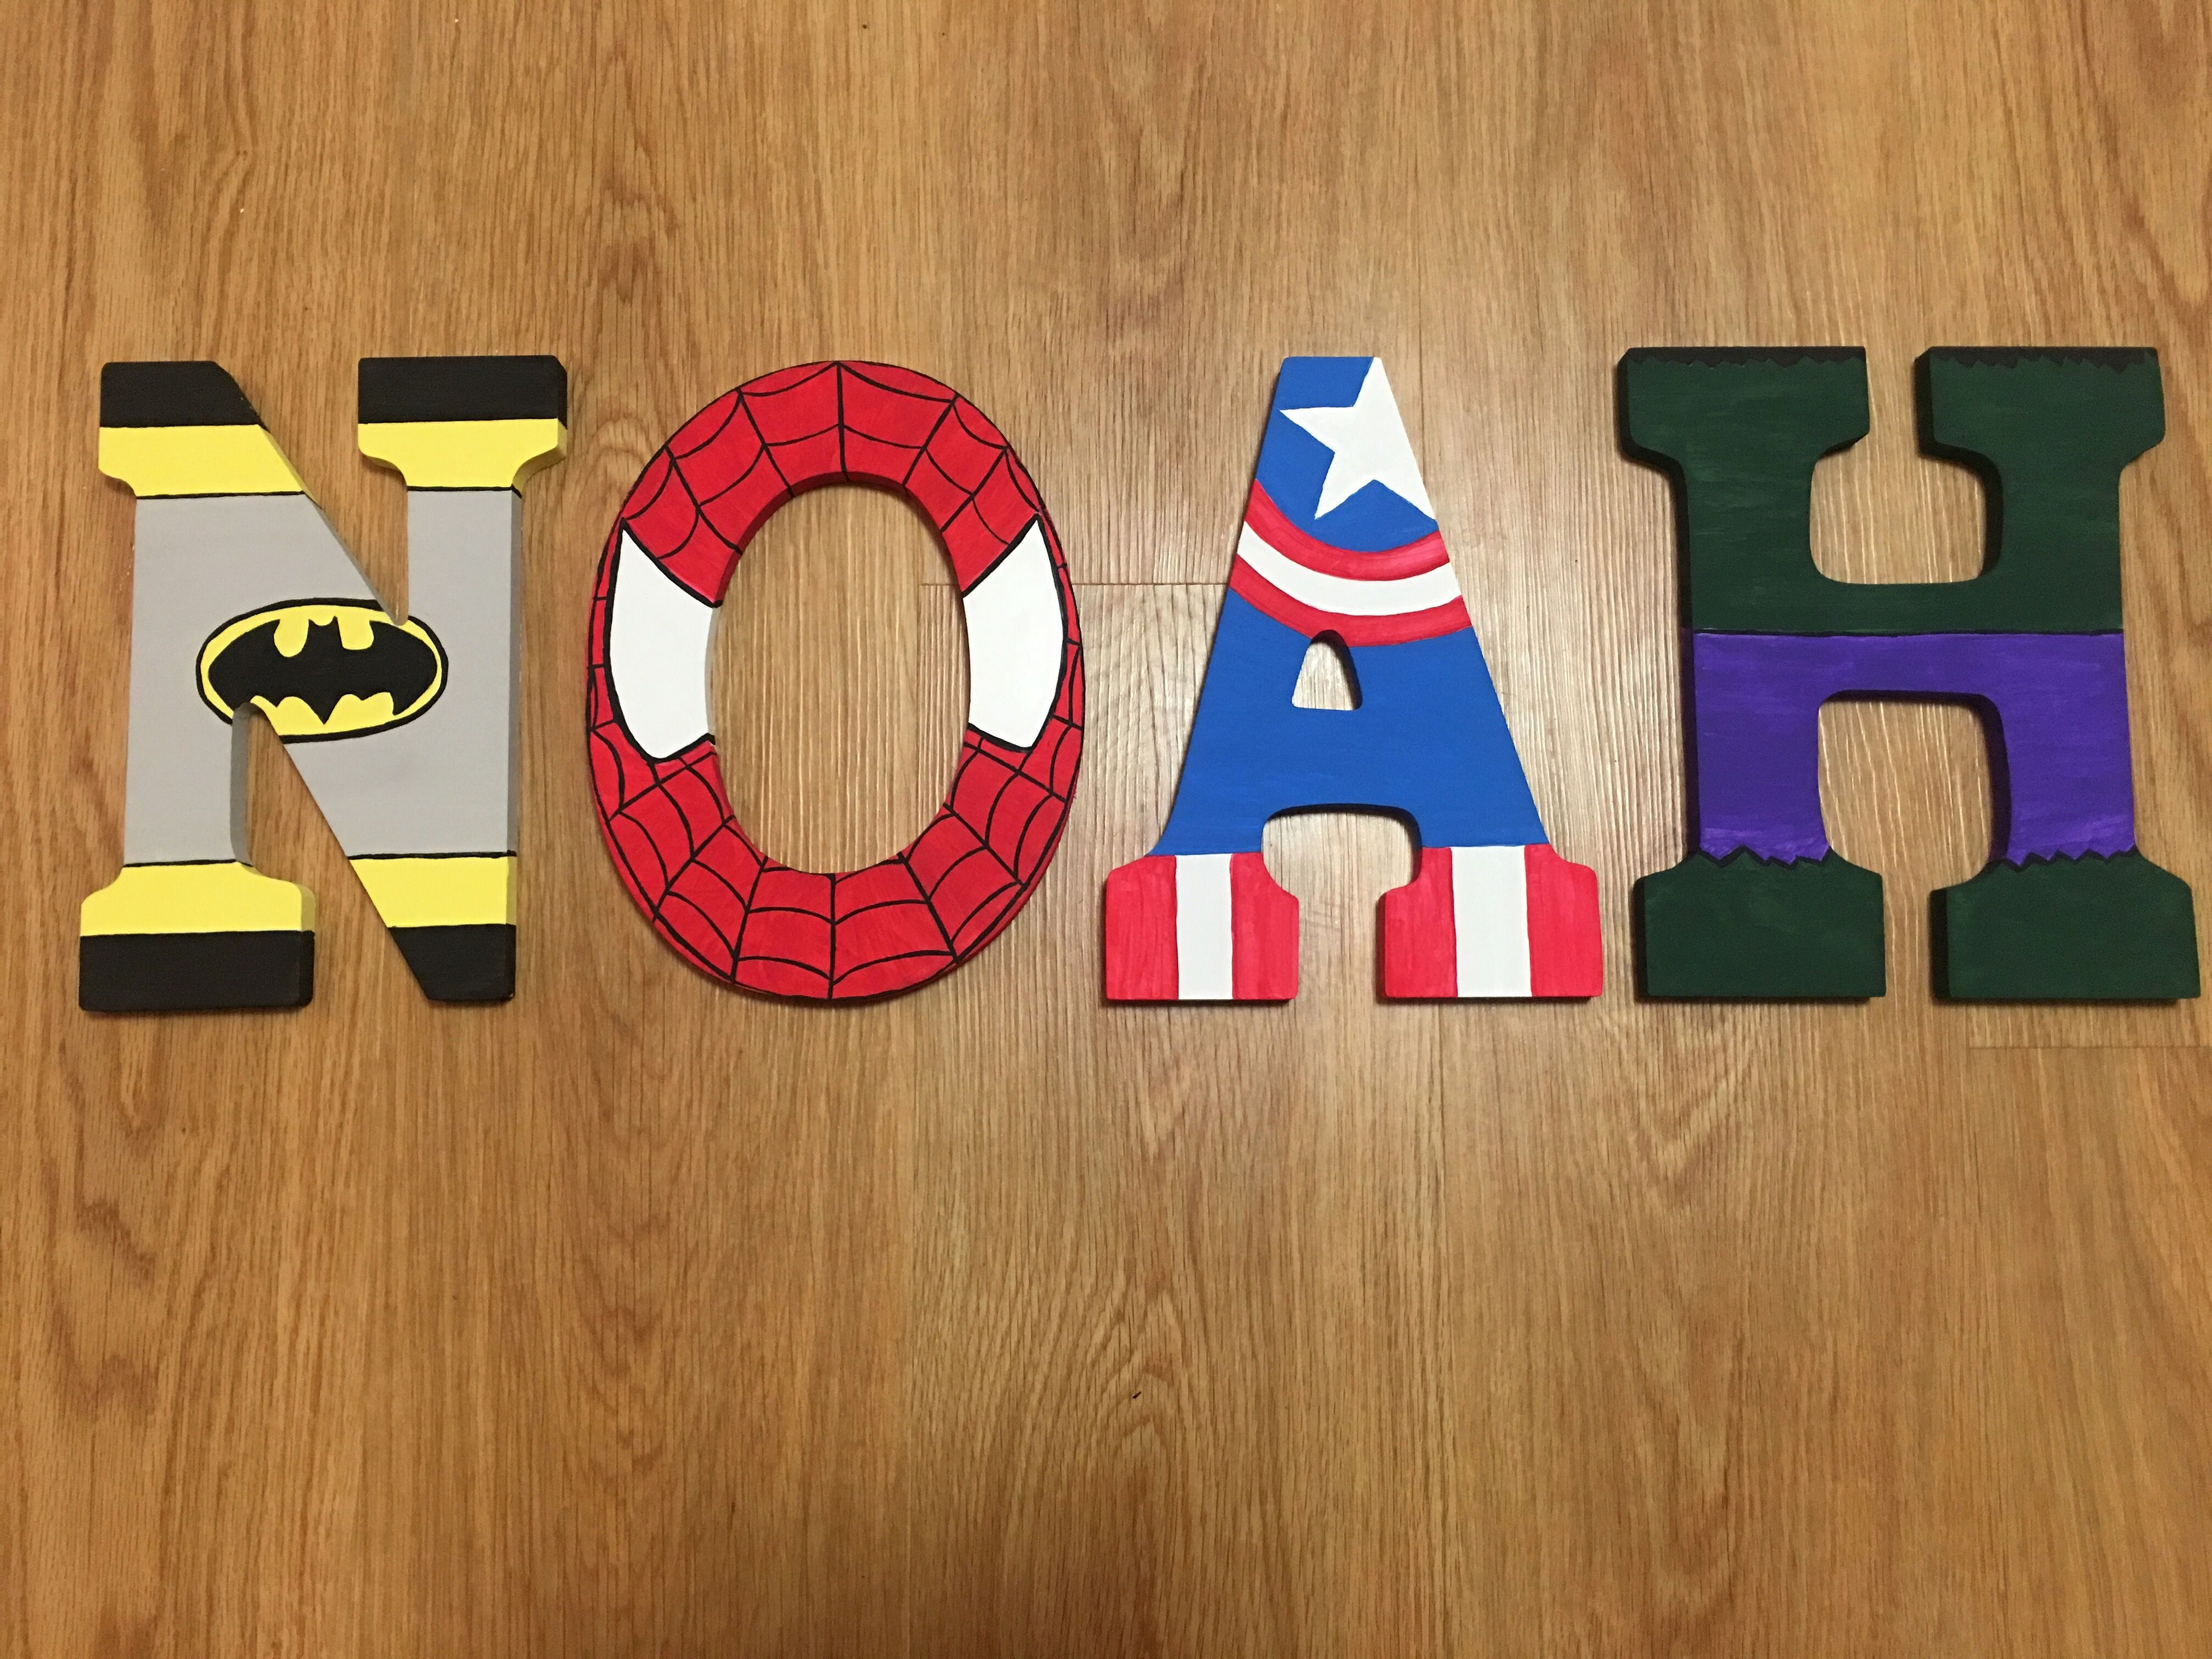 Superhero letters avengers marvel D C ics batman Spider Man